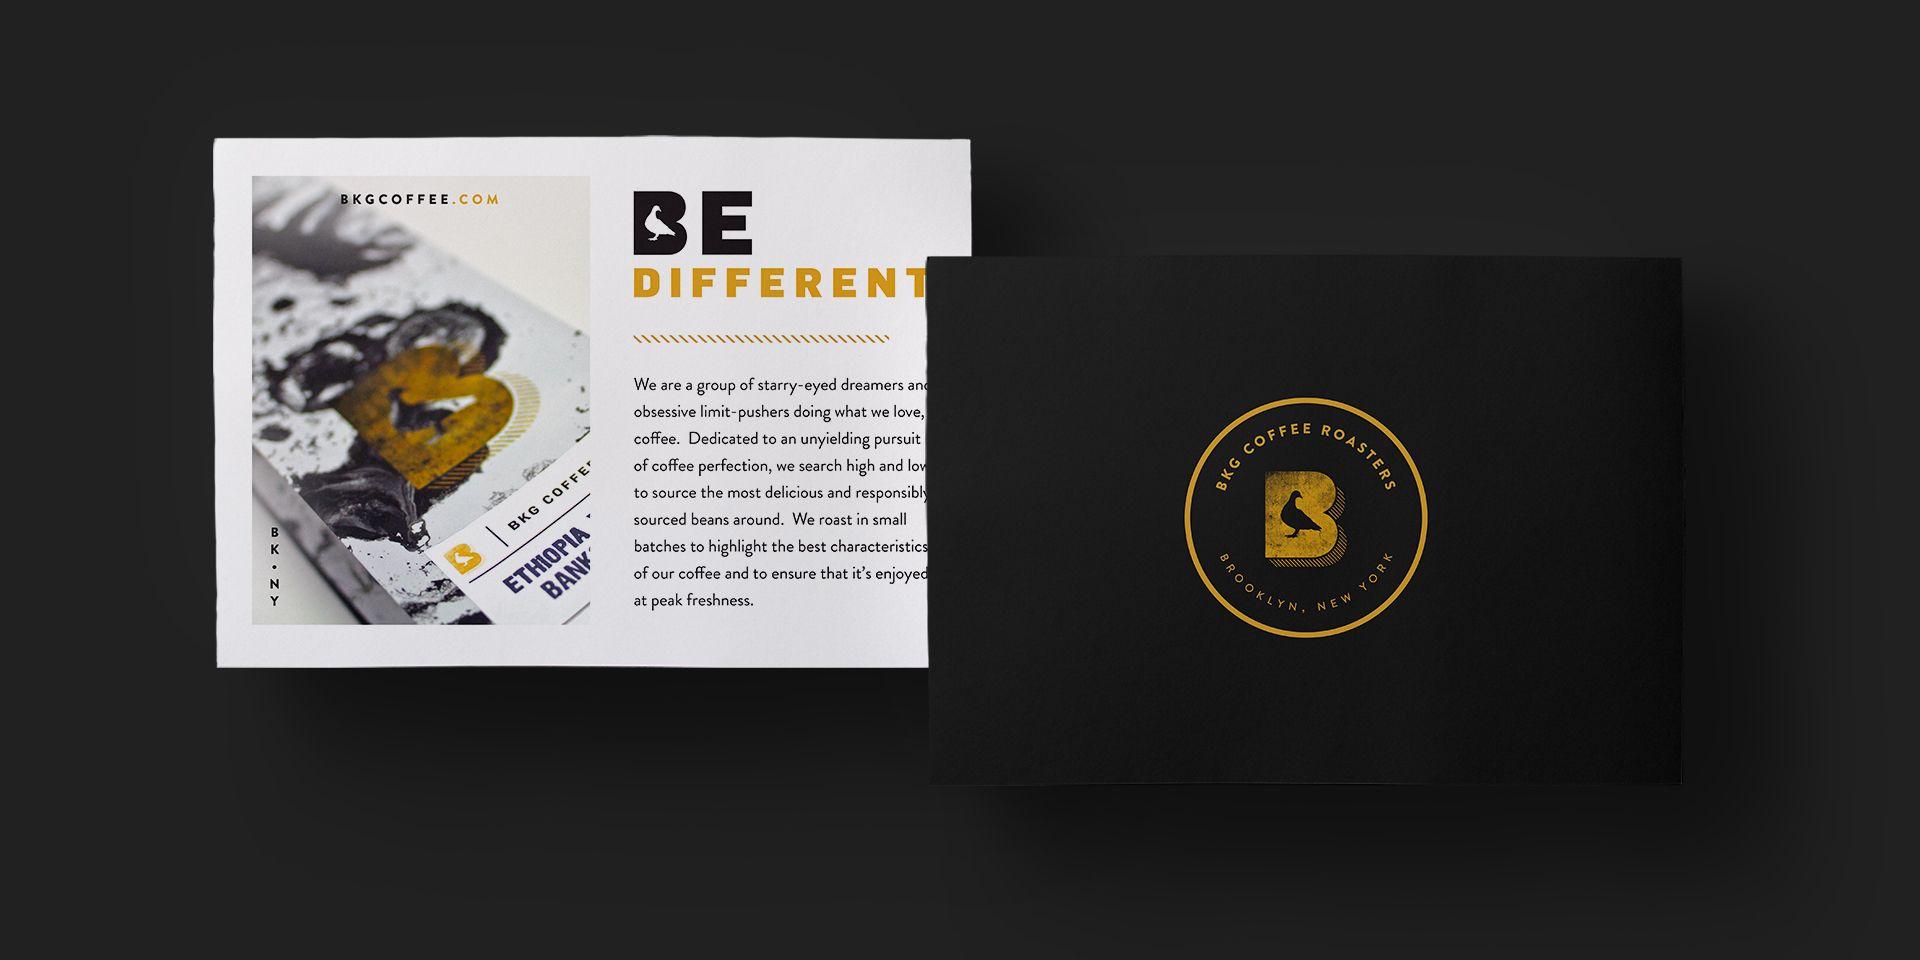 Dan Gearitybrand Packaging For Brooklyn Coffee Roaster Bkg Coffee Brooklyn Coffee Brand Packaging Coffee Roasters